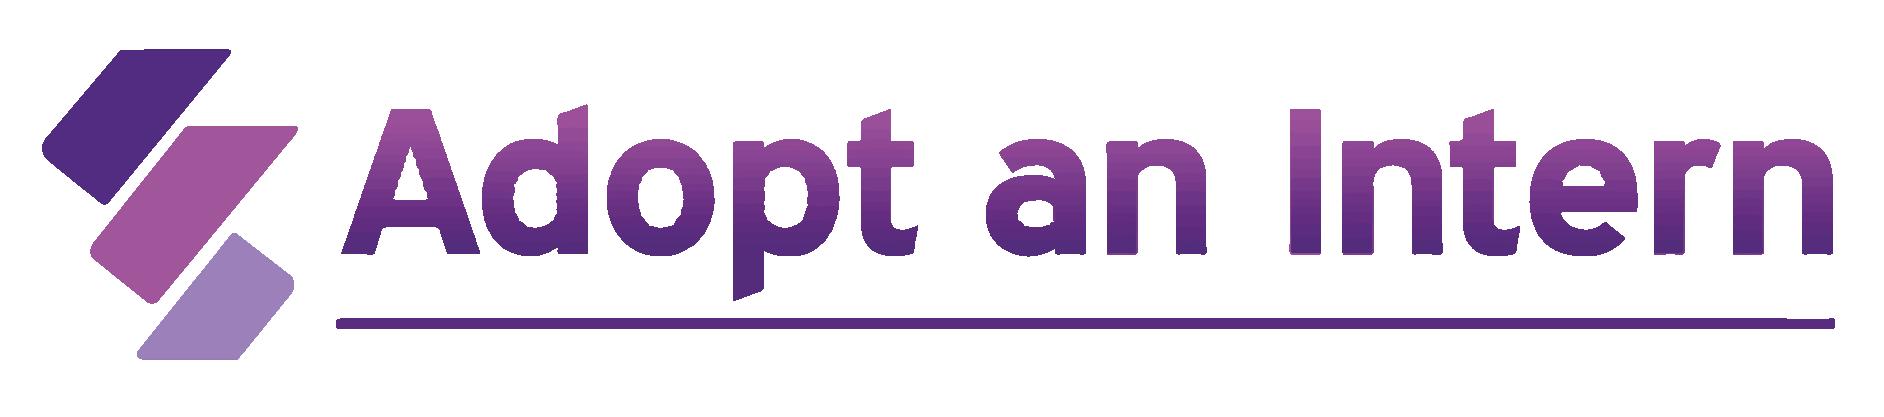 Adopt_an_Intern_logo-01.png